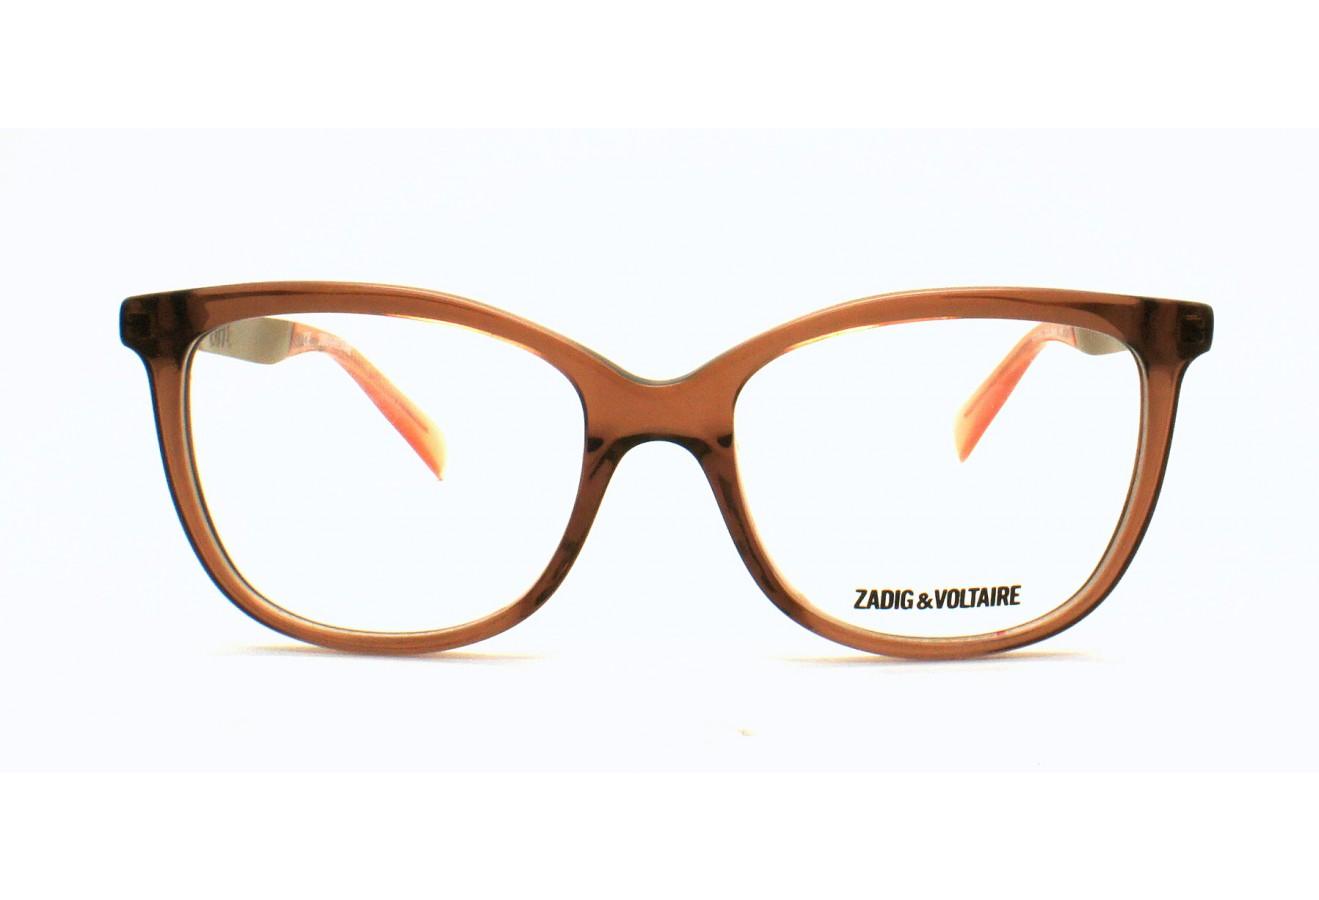 lunettes de vue zadig et voltaire vzv 085 0b36 52 17. Black Bedroom Furniture Sets. Home Design Ideas